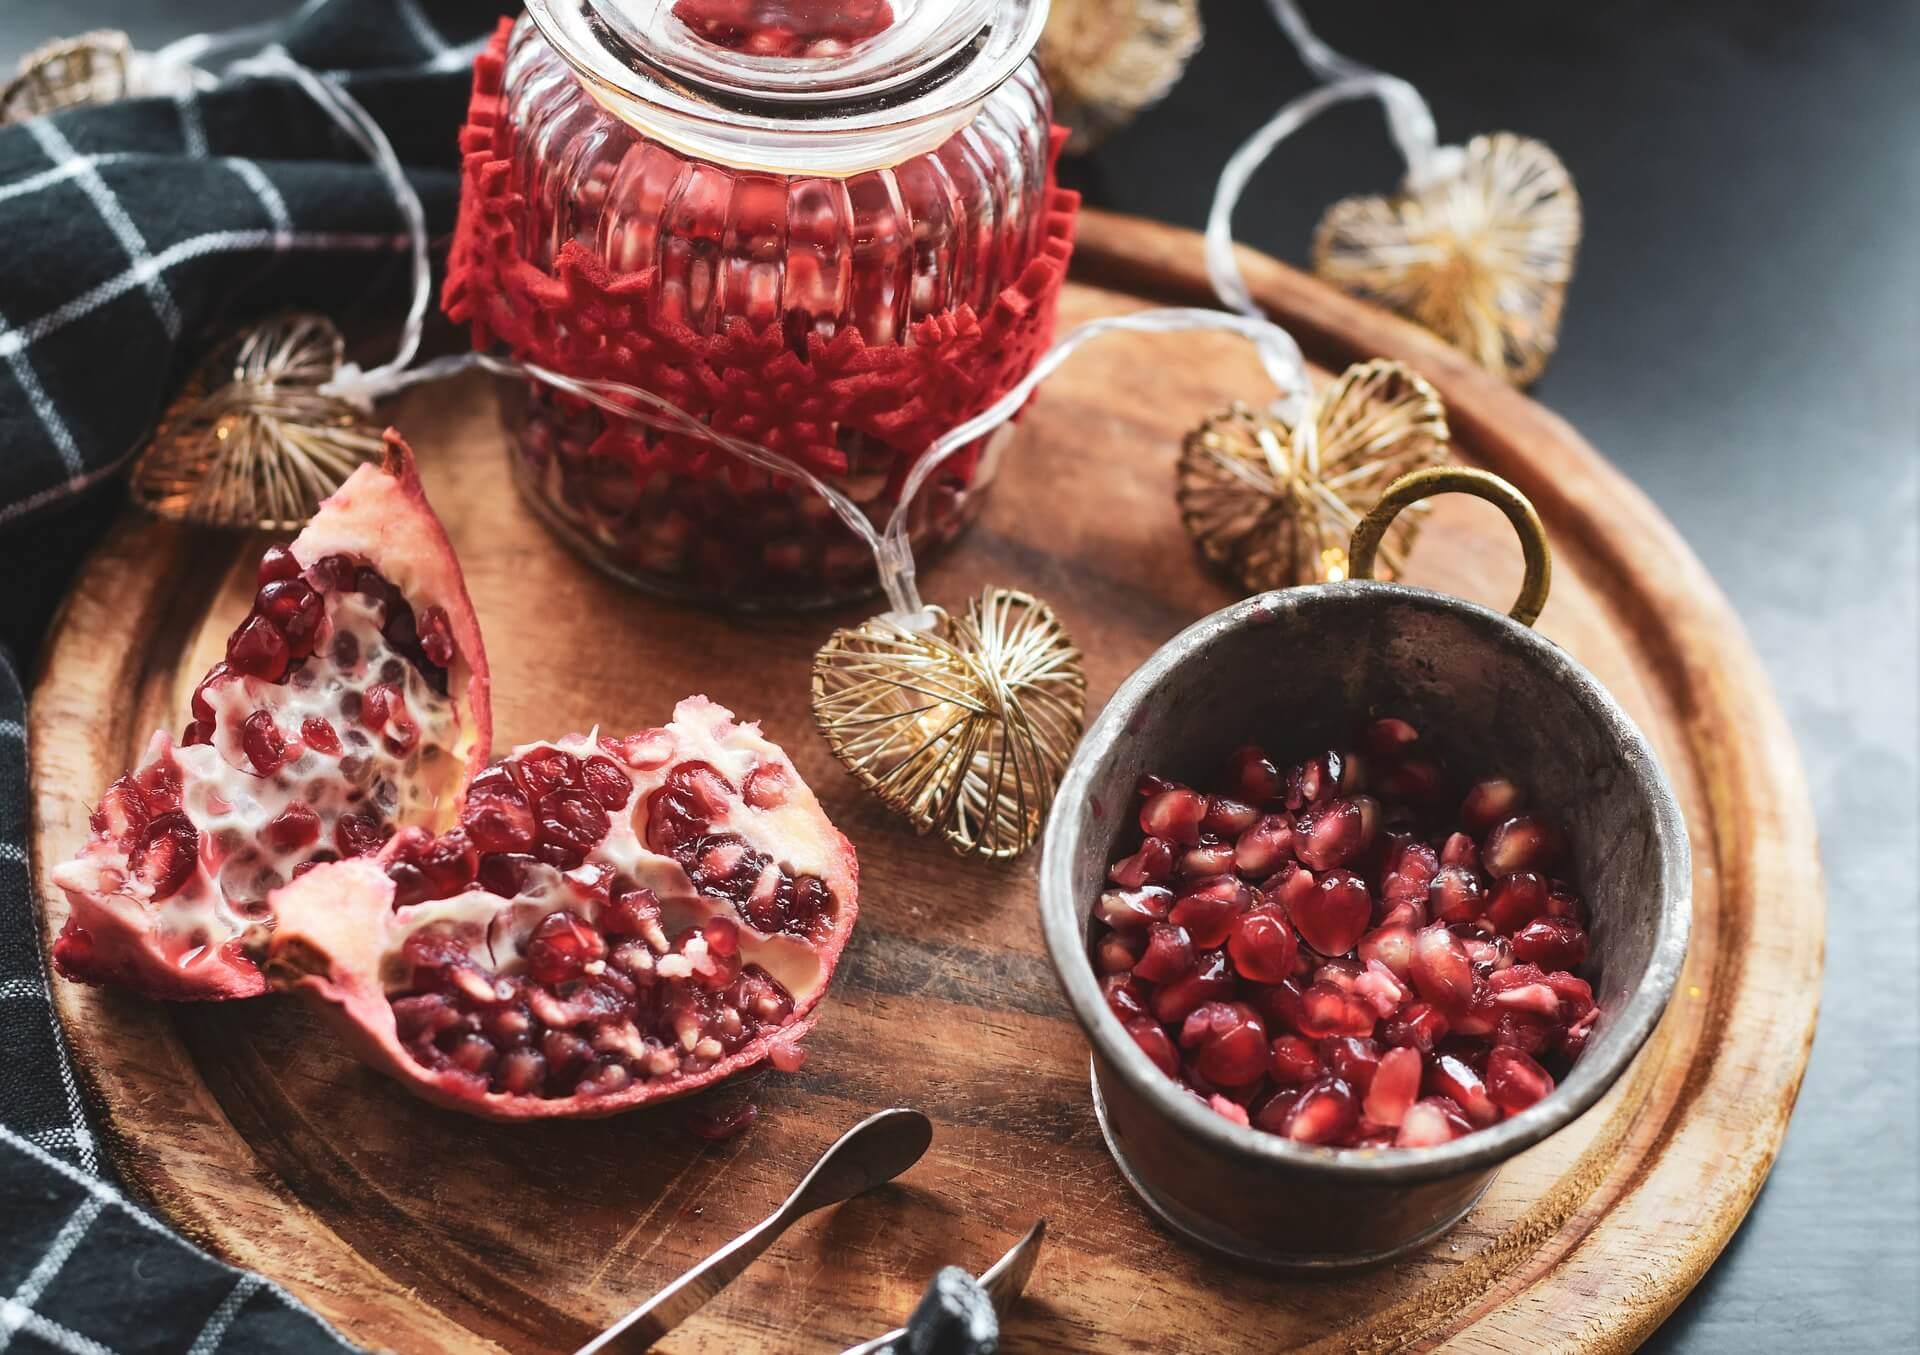 Break the pomegranate – Greek holiday tradition